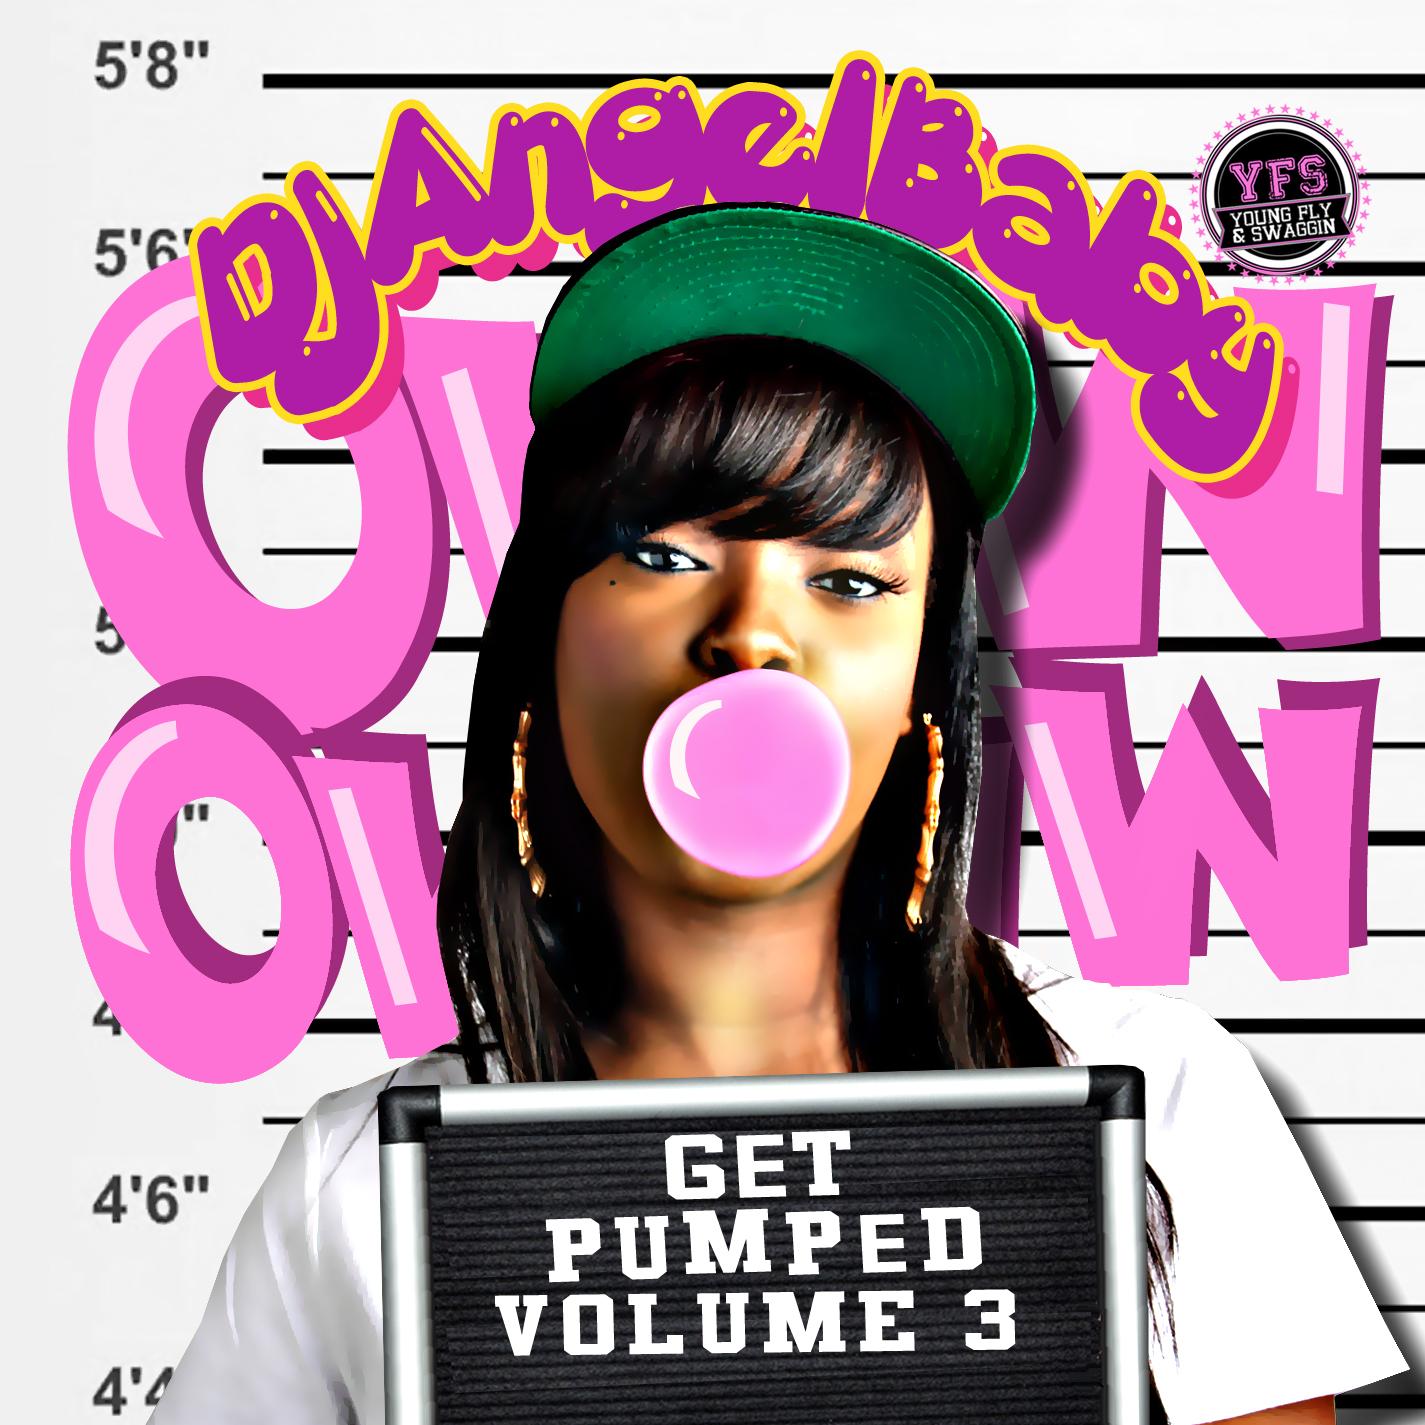 FRONT(DJ AngelBaby - Get Pumped Vol. 3).JPG